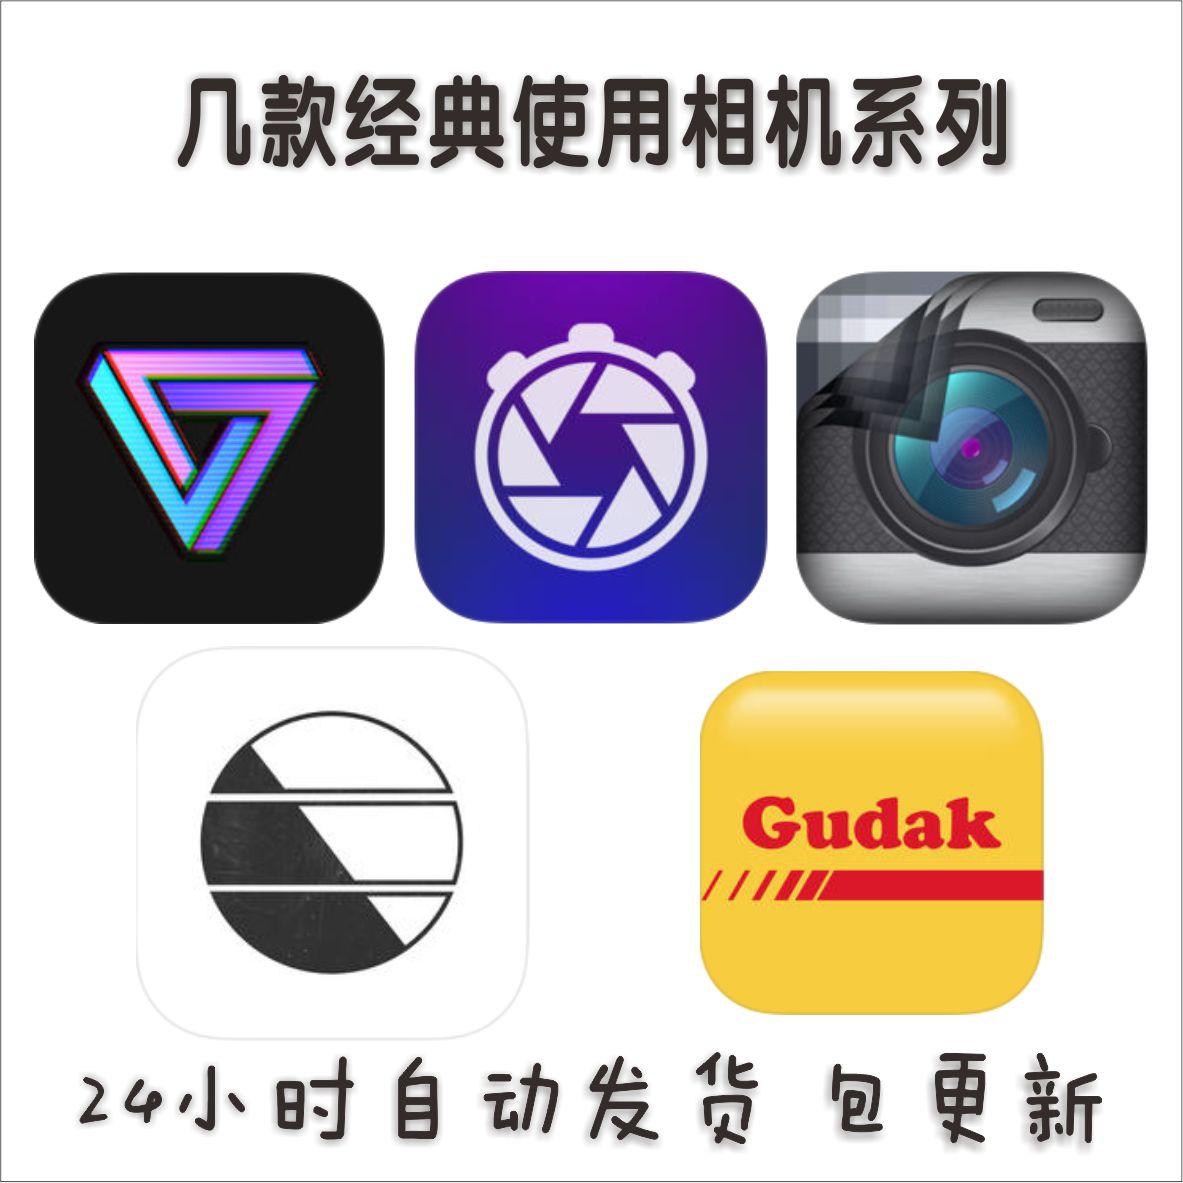 Vaporcam Gudak Cam медленно затвор камера Molight Cortex Camera app